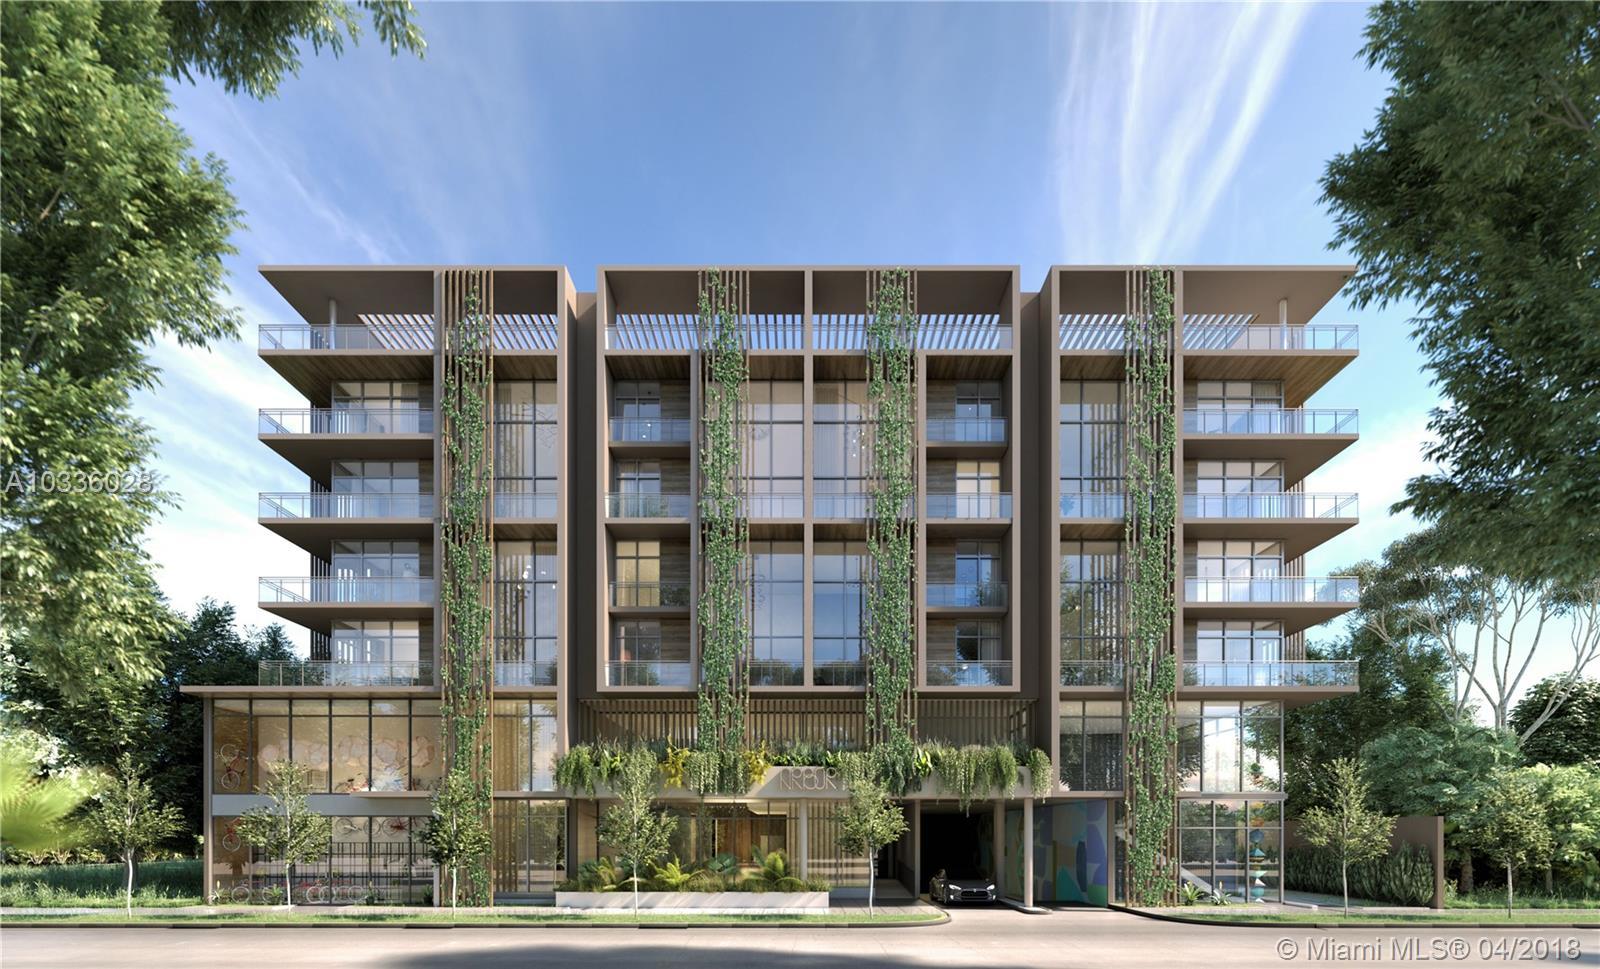 3034 Oak Avenue, 206 - Miami, Florida